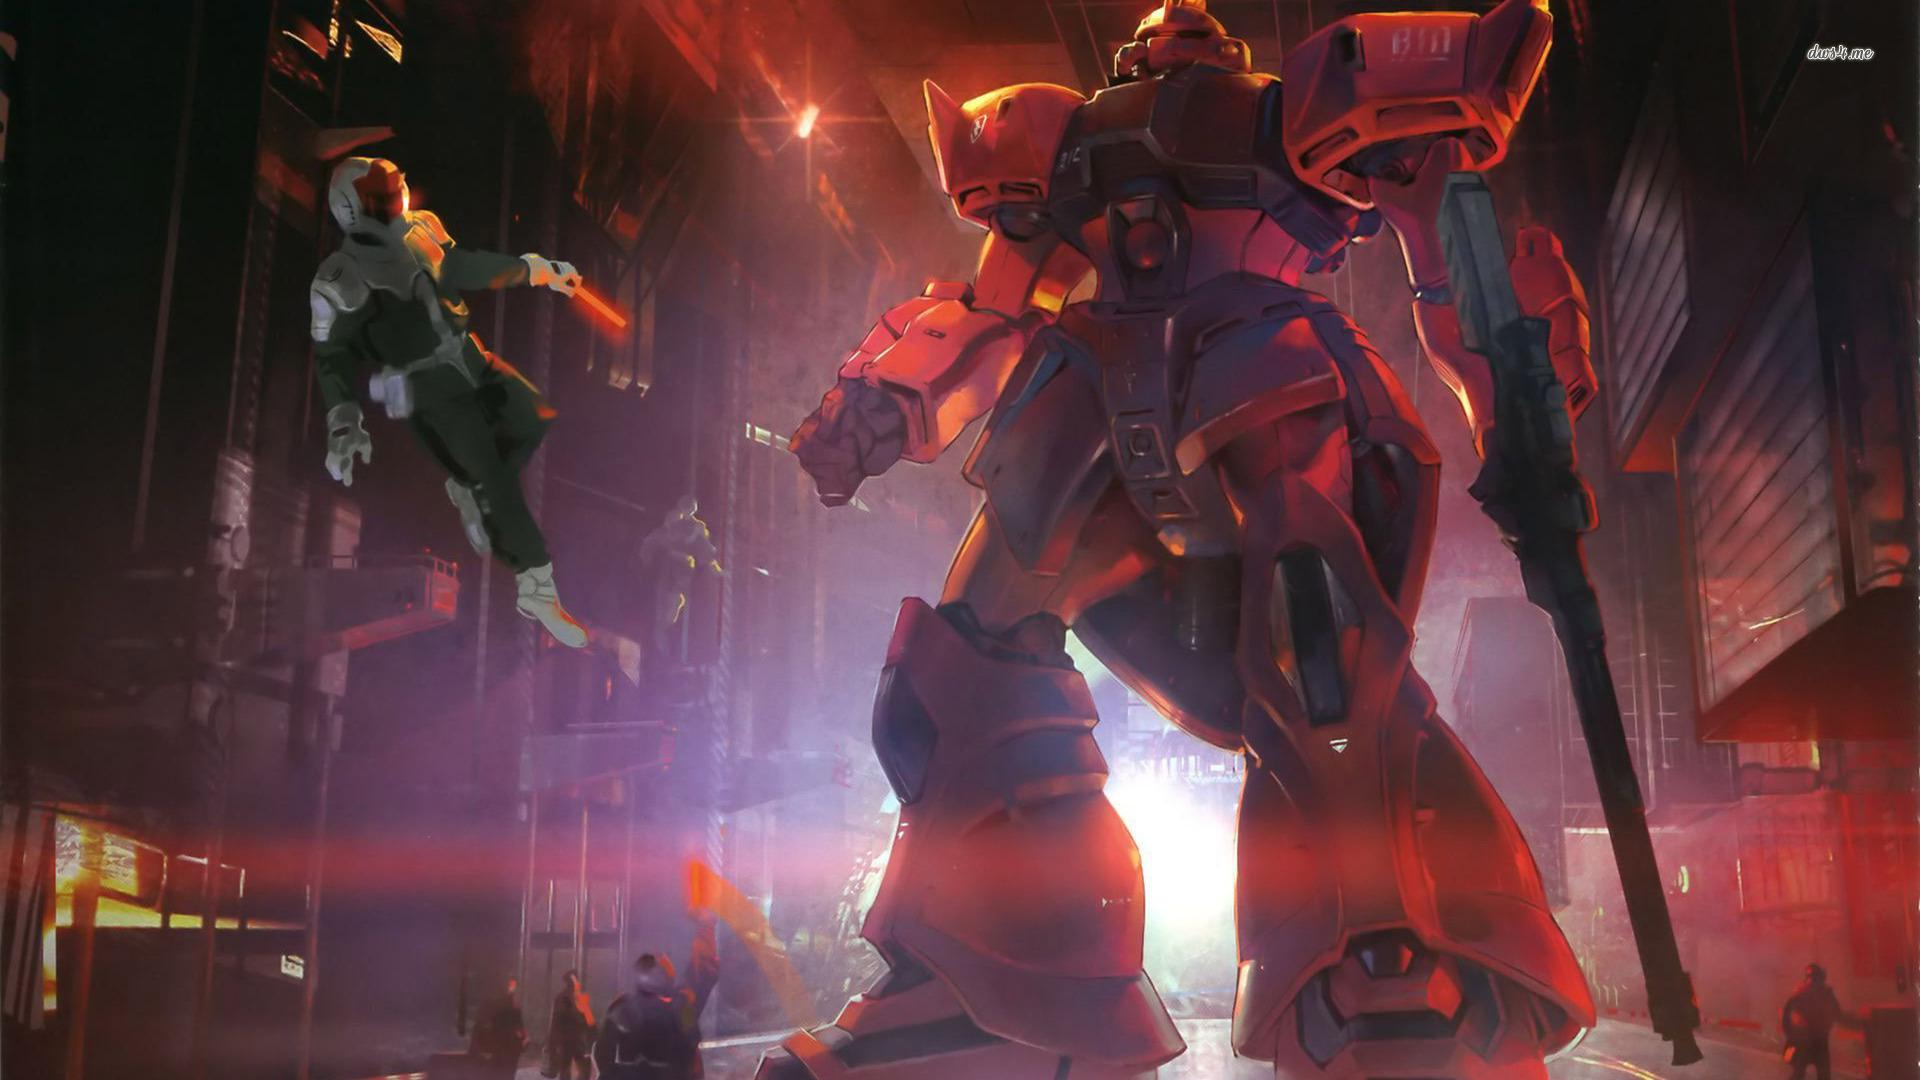 MS 14Jg Gelgoog Jager   Gundam wallpaper   Anime wallpapers   22815 1920x1080